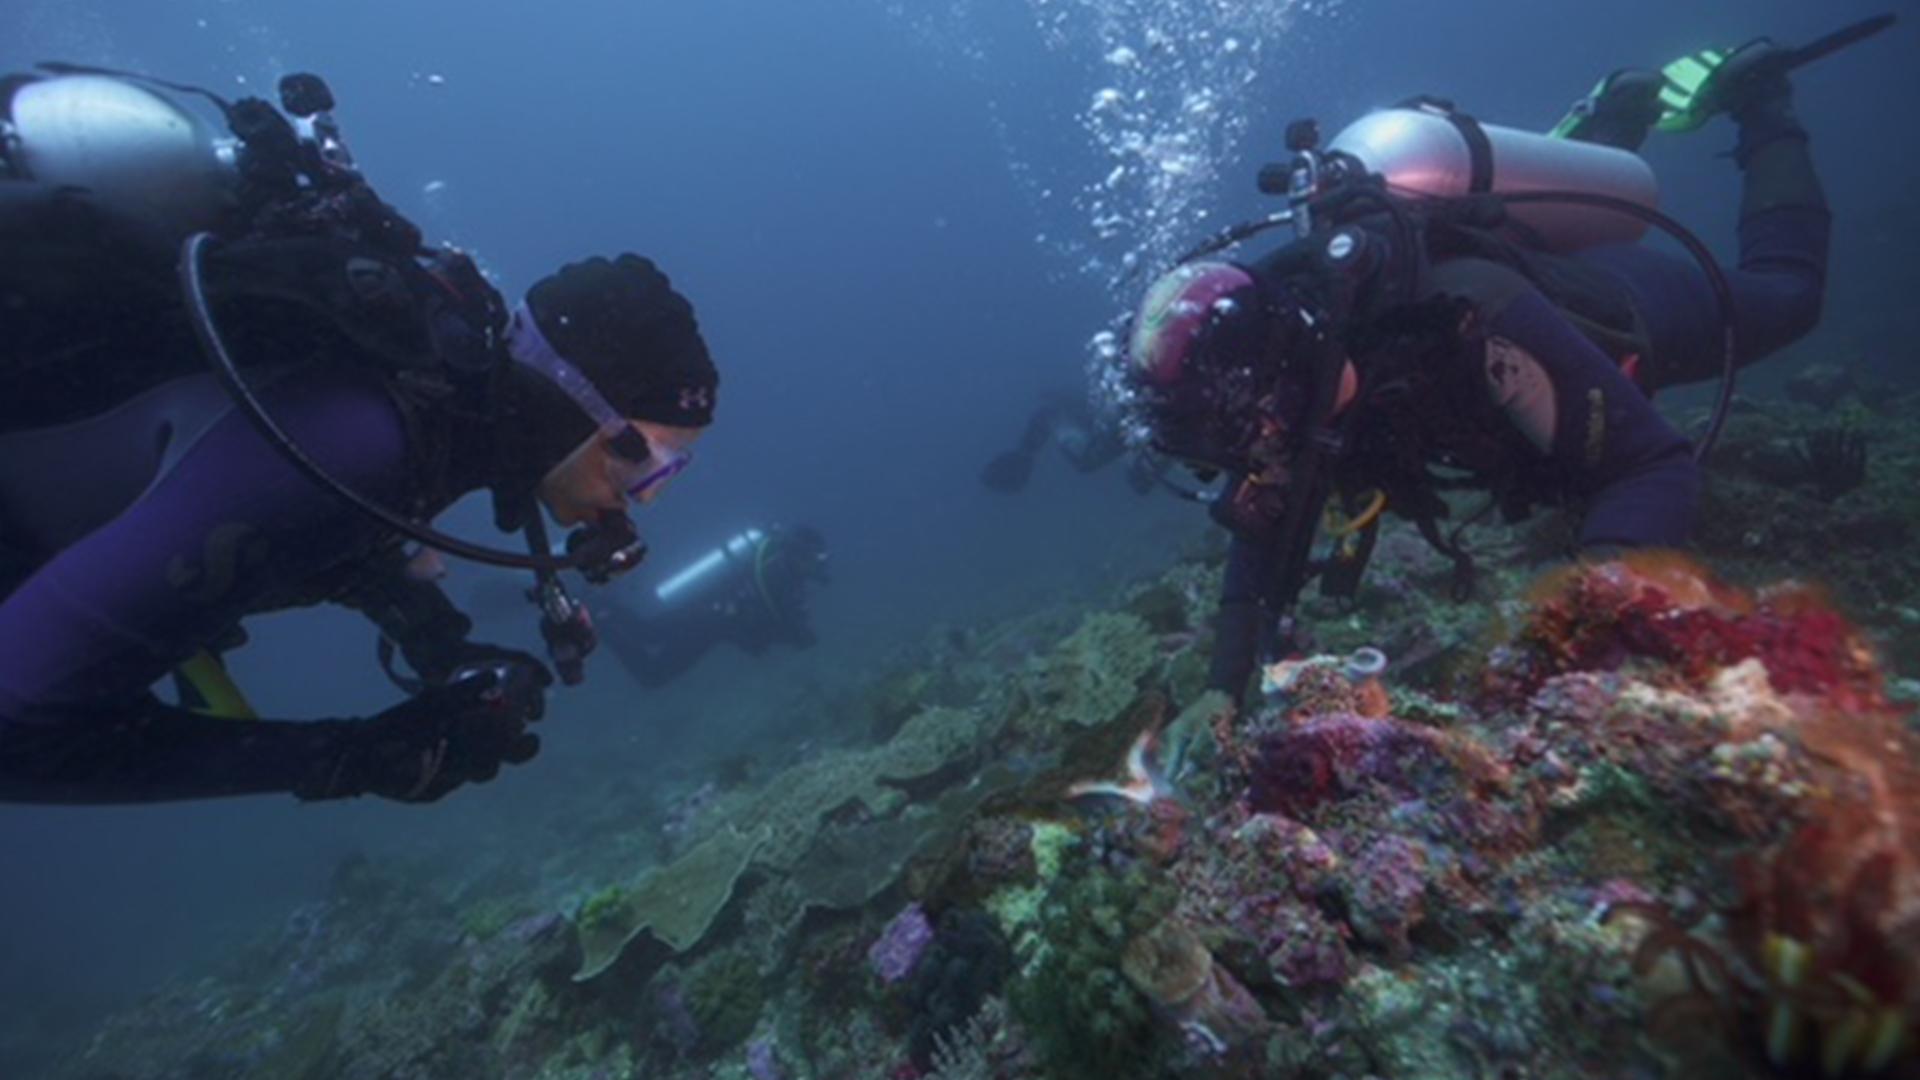 Fisk Johnson Looking at Microplastics